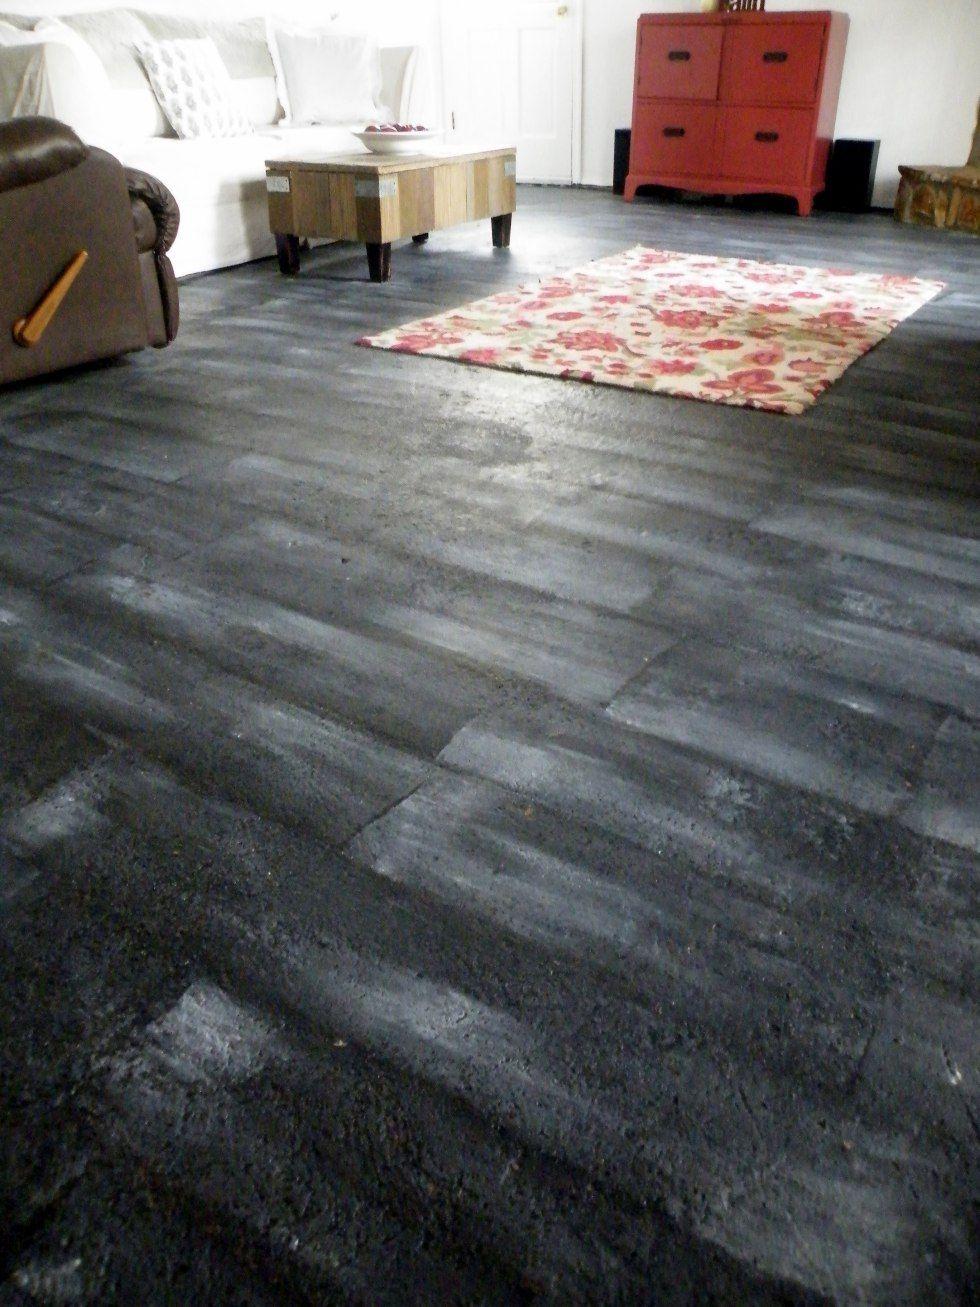 Living Room Floor Done Painted Cement Floors Painted Concrete Floors Painting Concrete